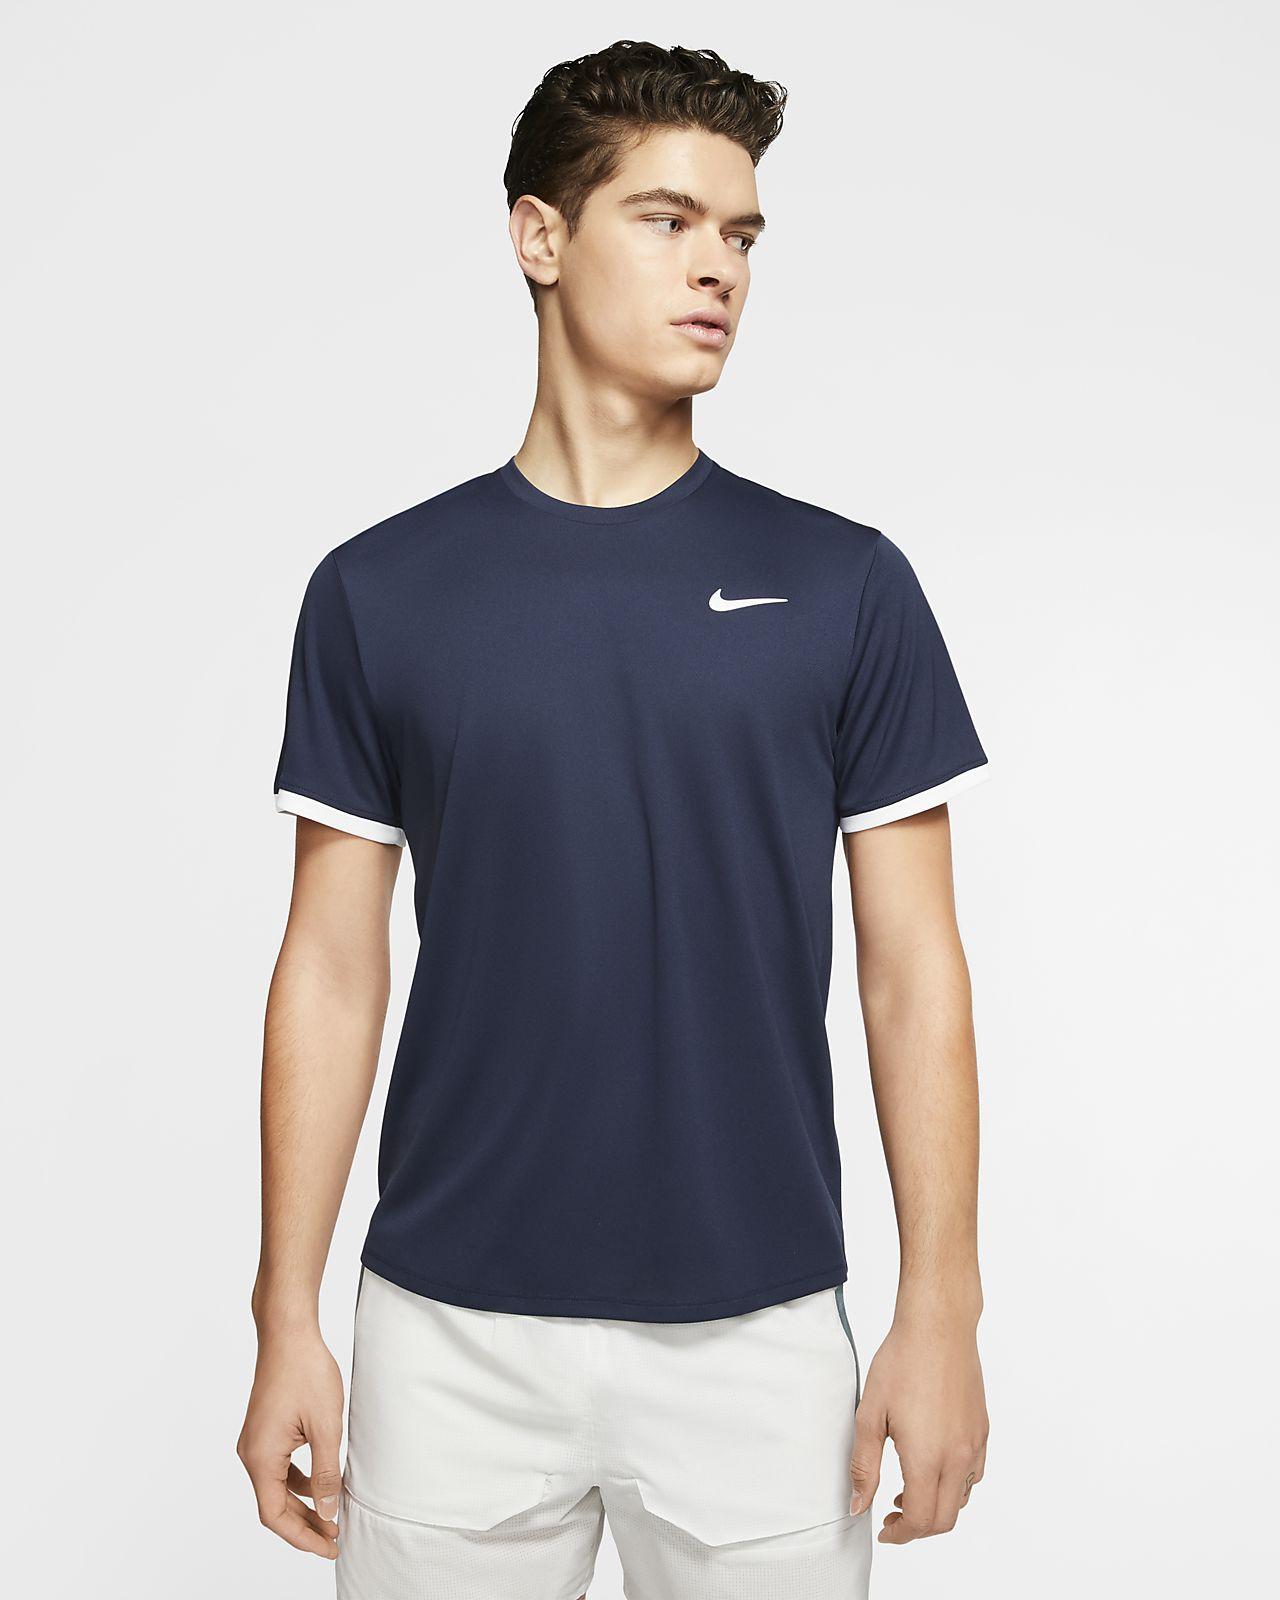 Nike Men`s NikeCourt Dri-FIT Tennis Short Sleeve Top